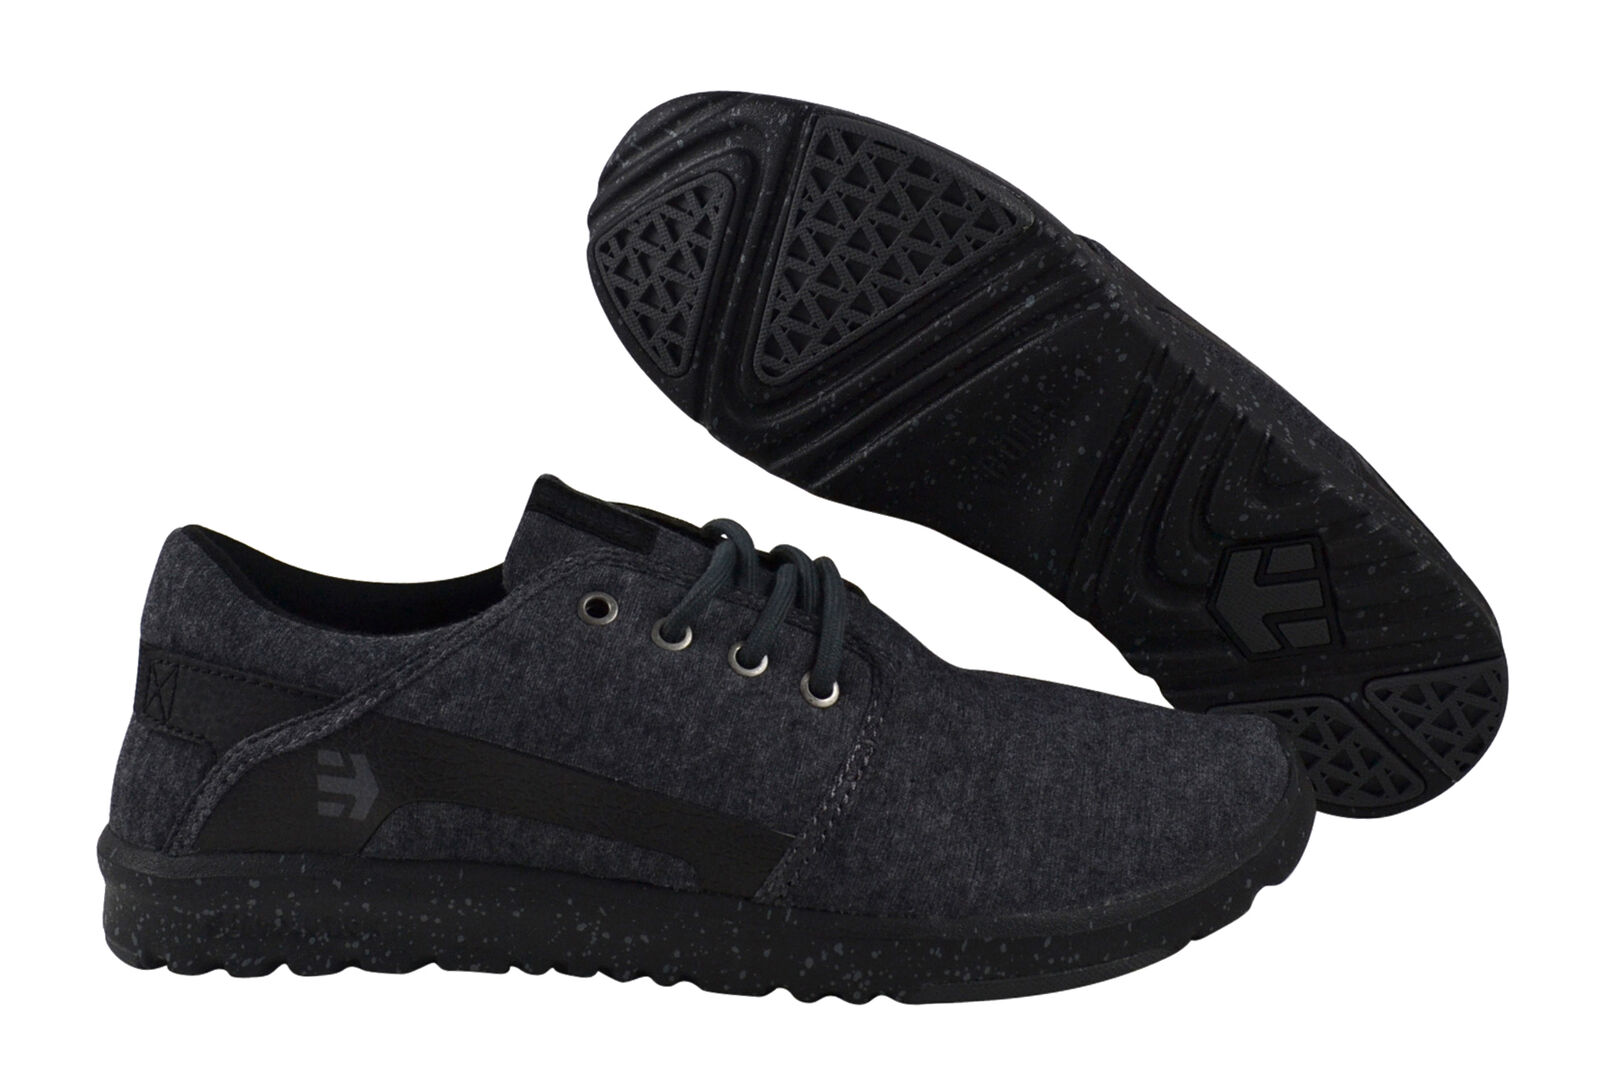 Turnschuhe Silber schwarz Scout Etnies Schuhe grau schwarz